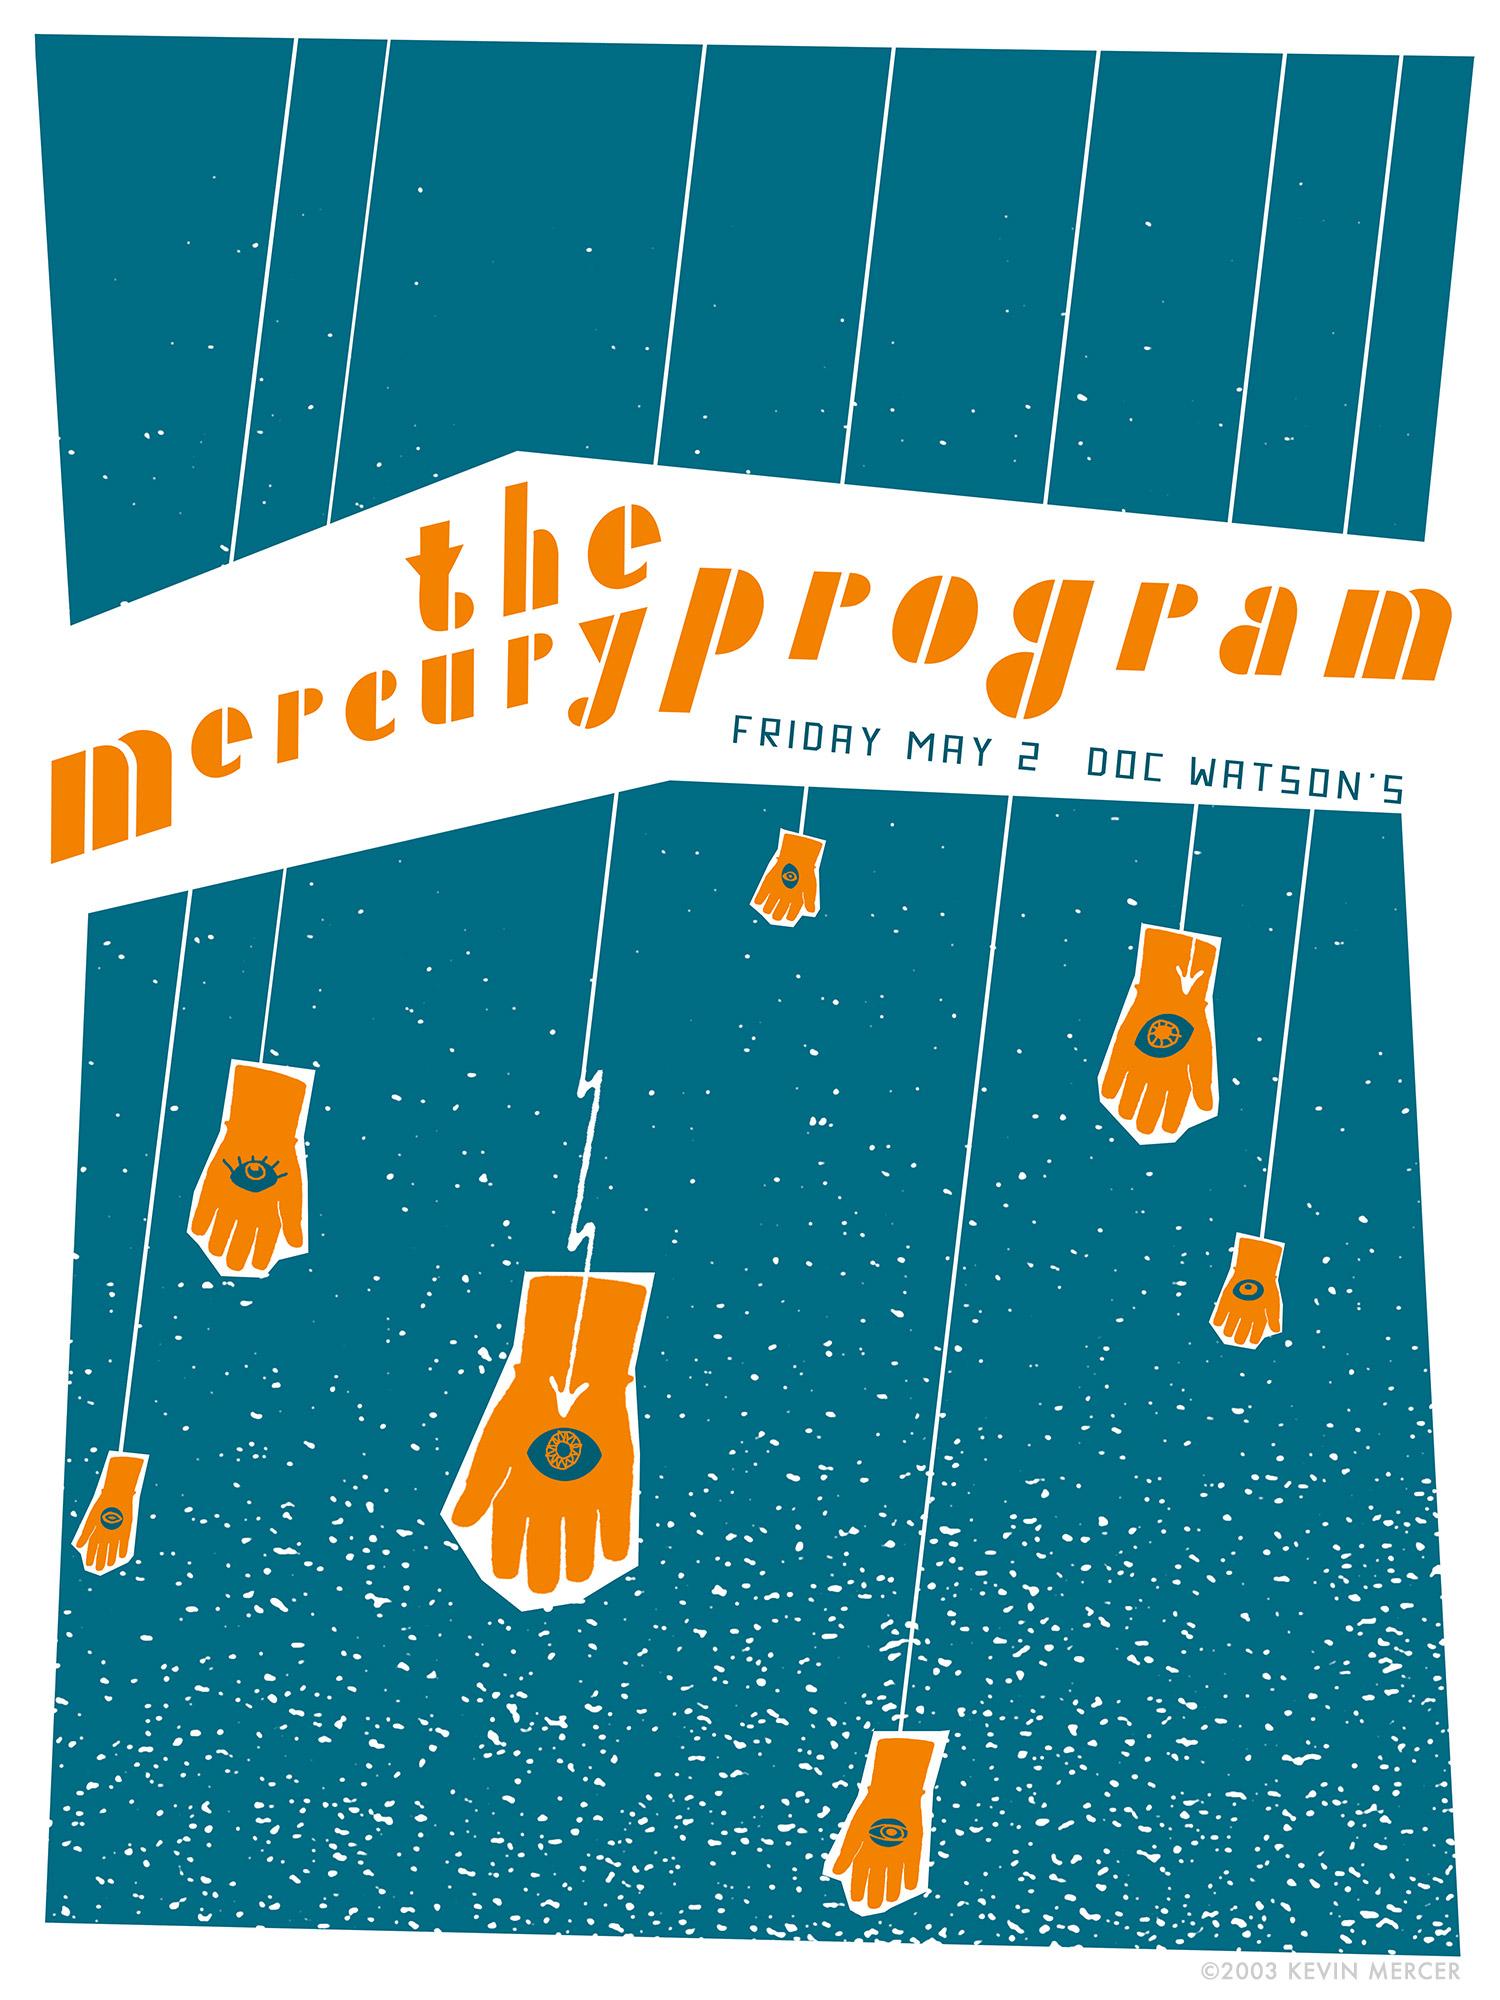 MercuryProgram2003-1500.jpg